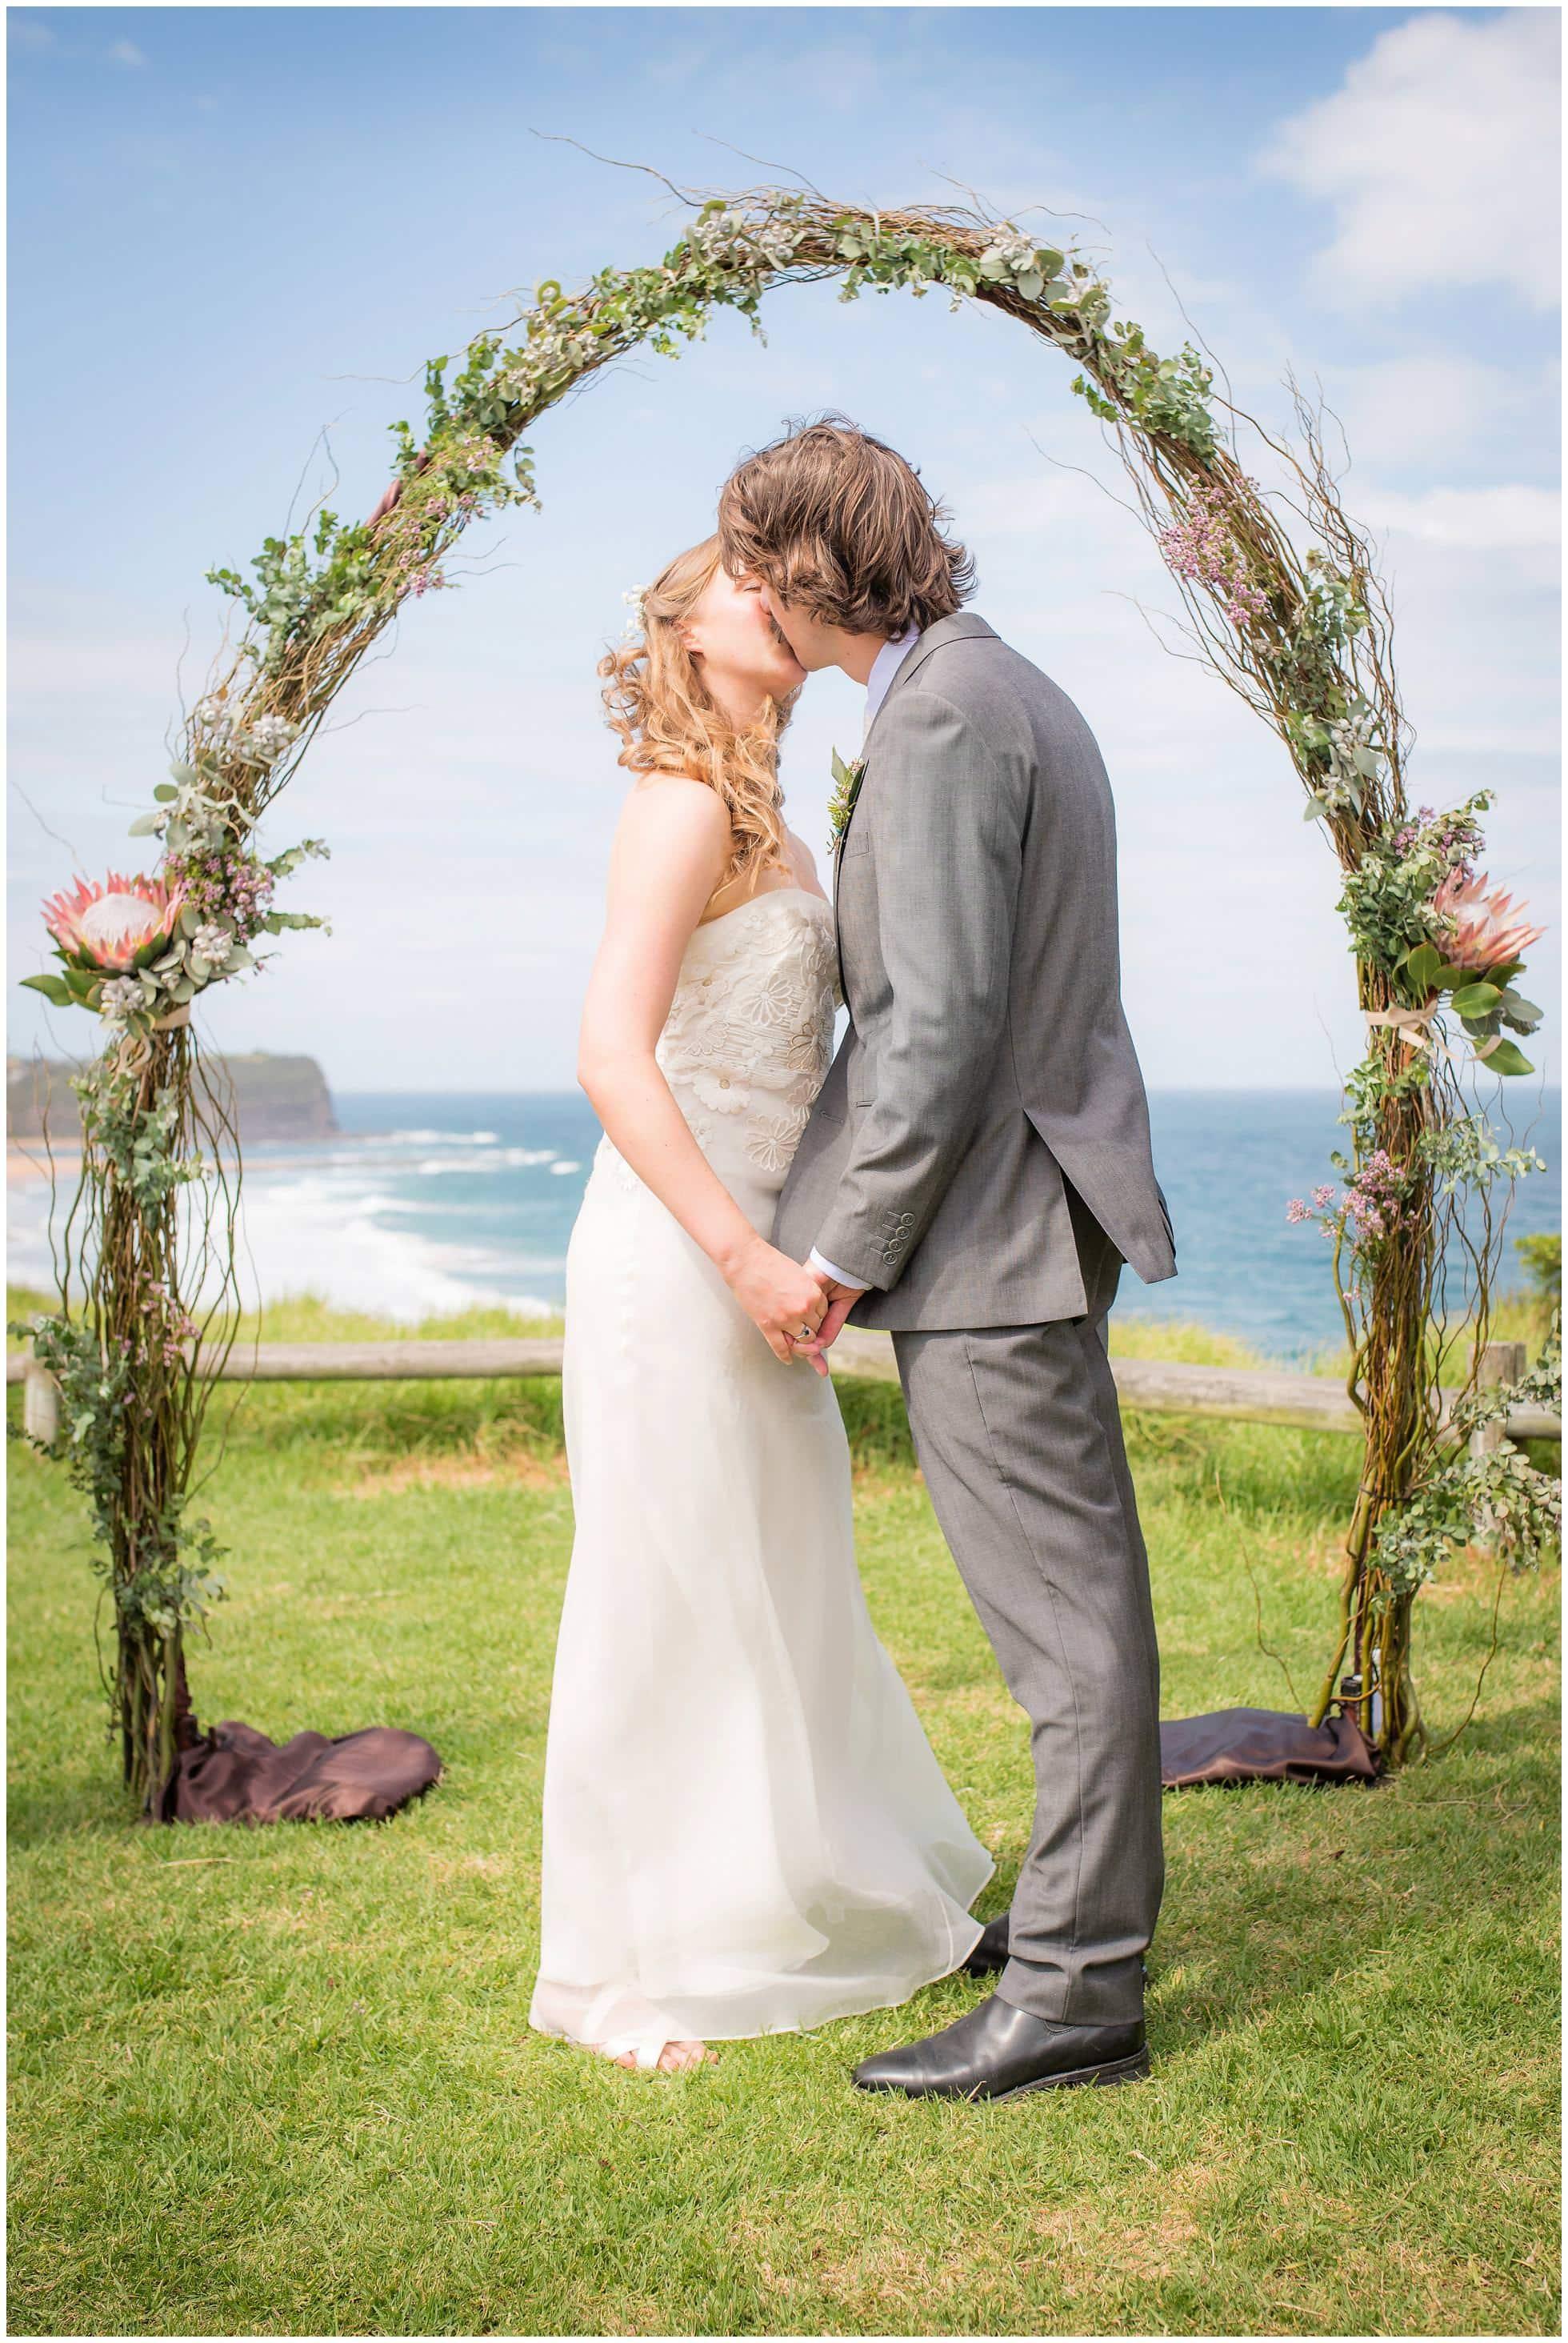 Mona Vale Sydney Wedding Photographer 032 - northern beaches wedding photography